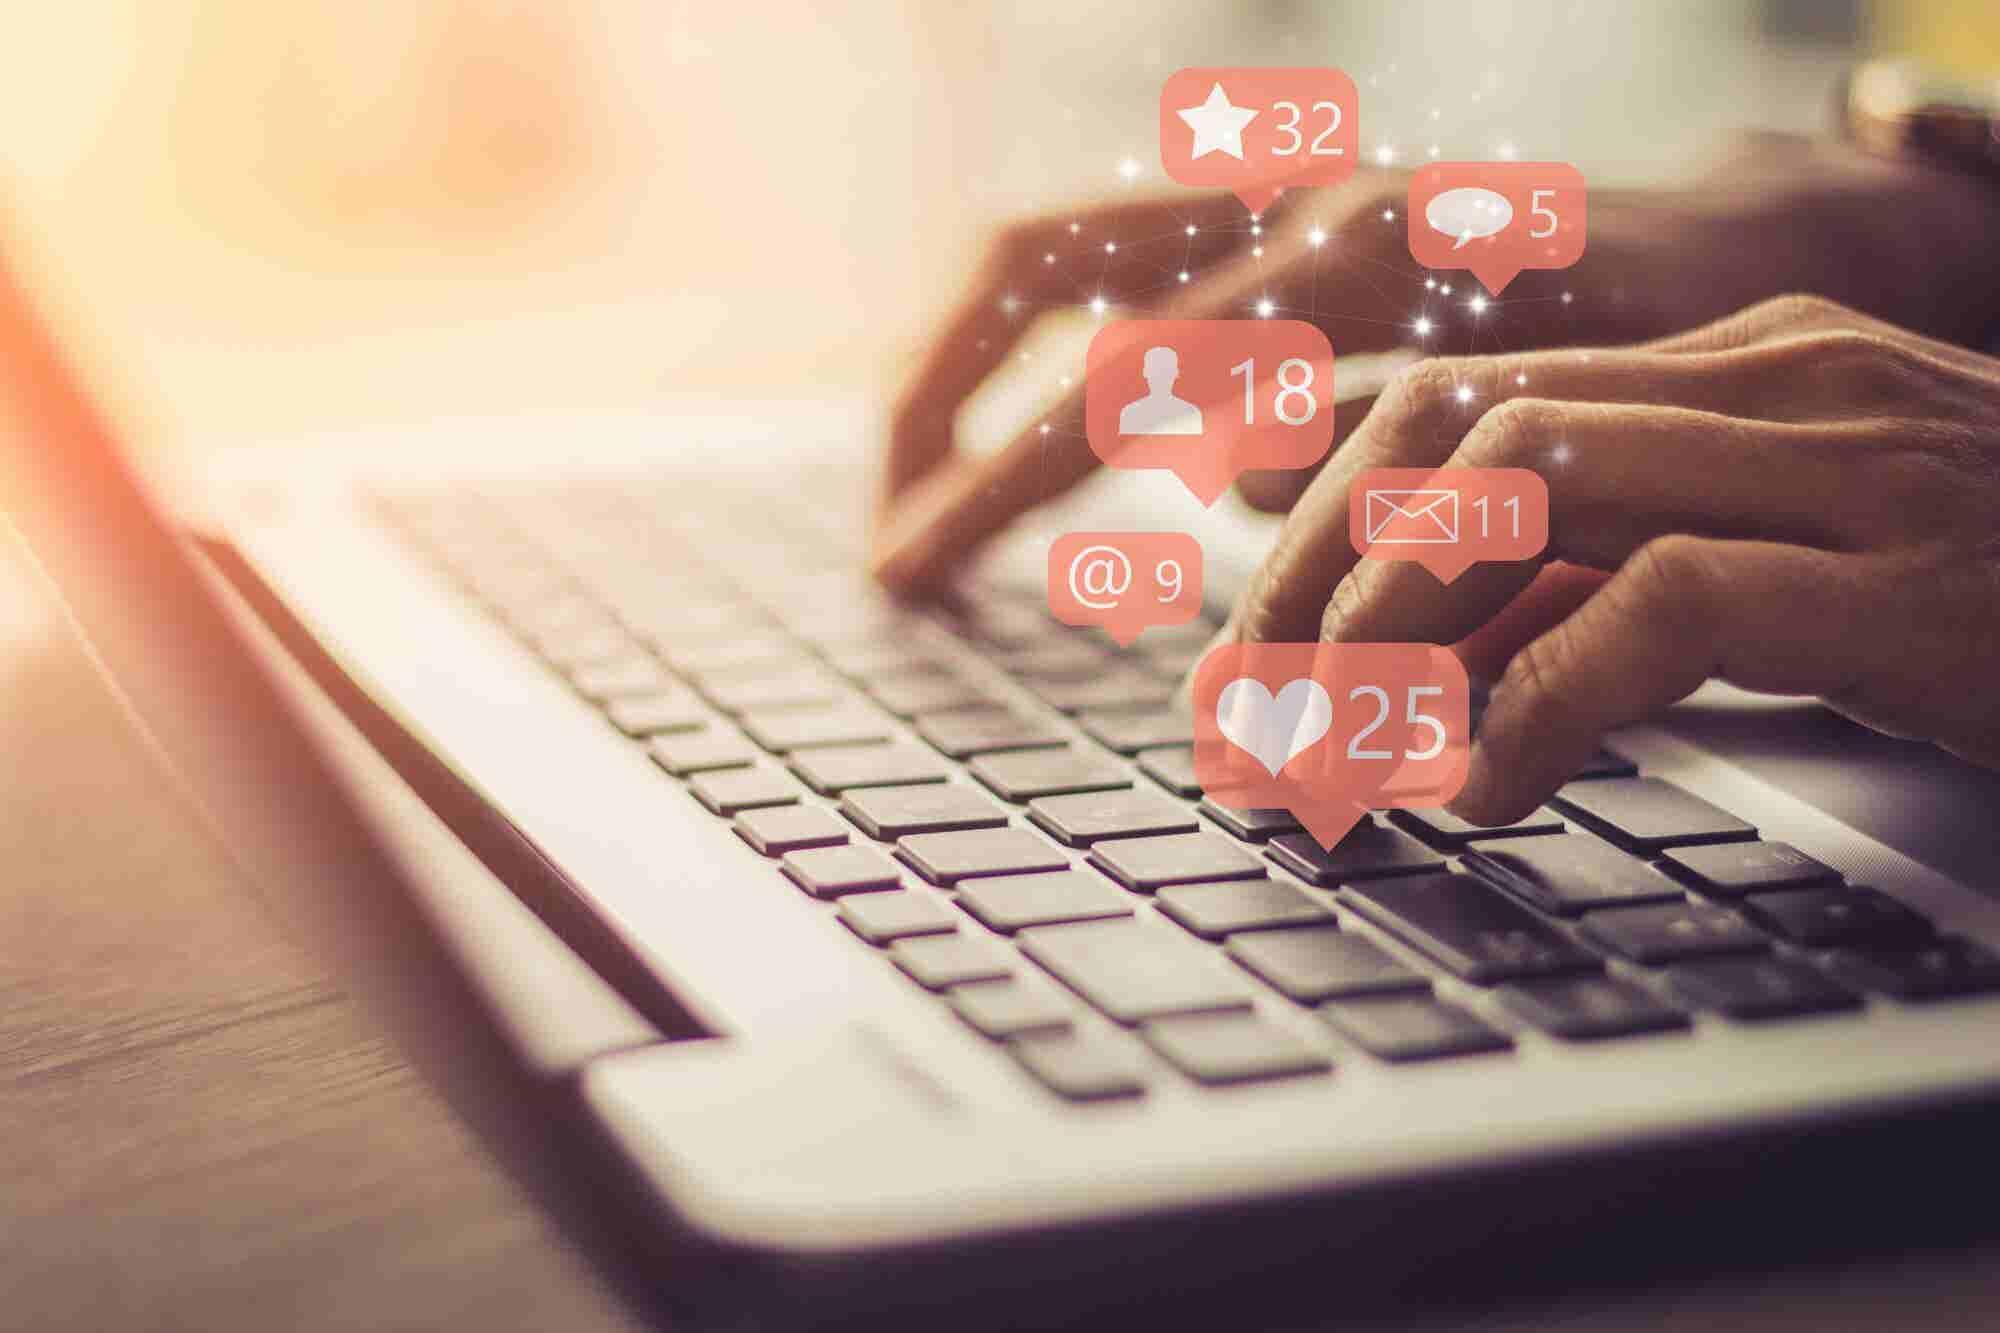 Industry 4.0: Innovation Through Digital Collaboration